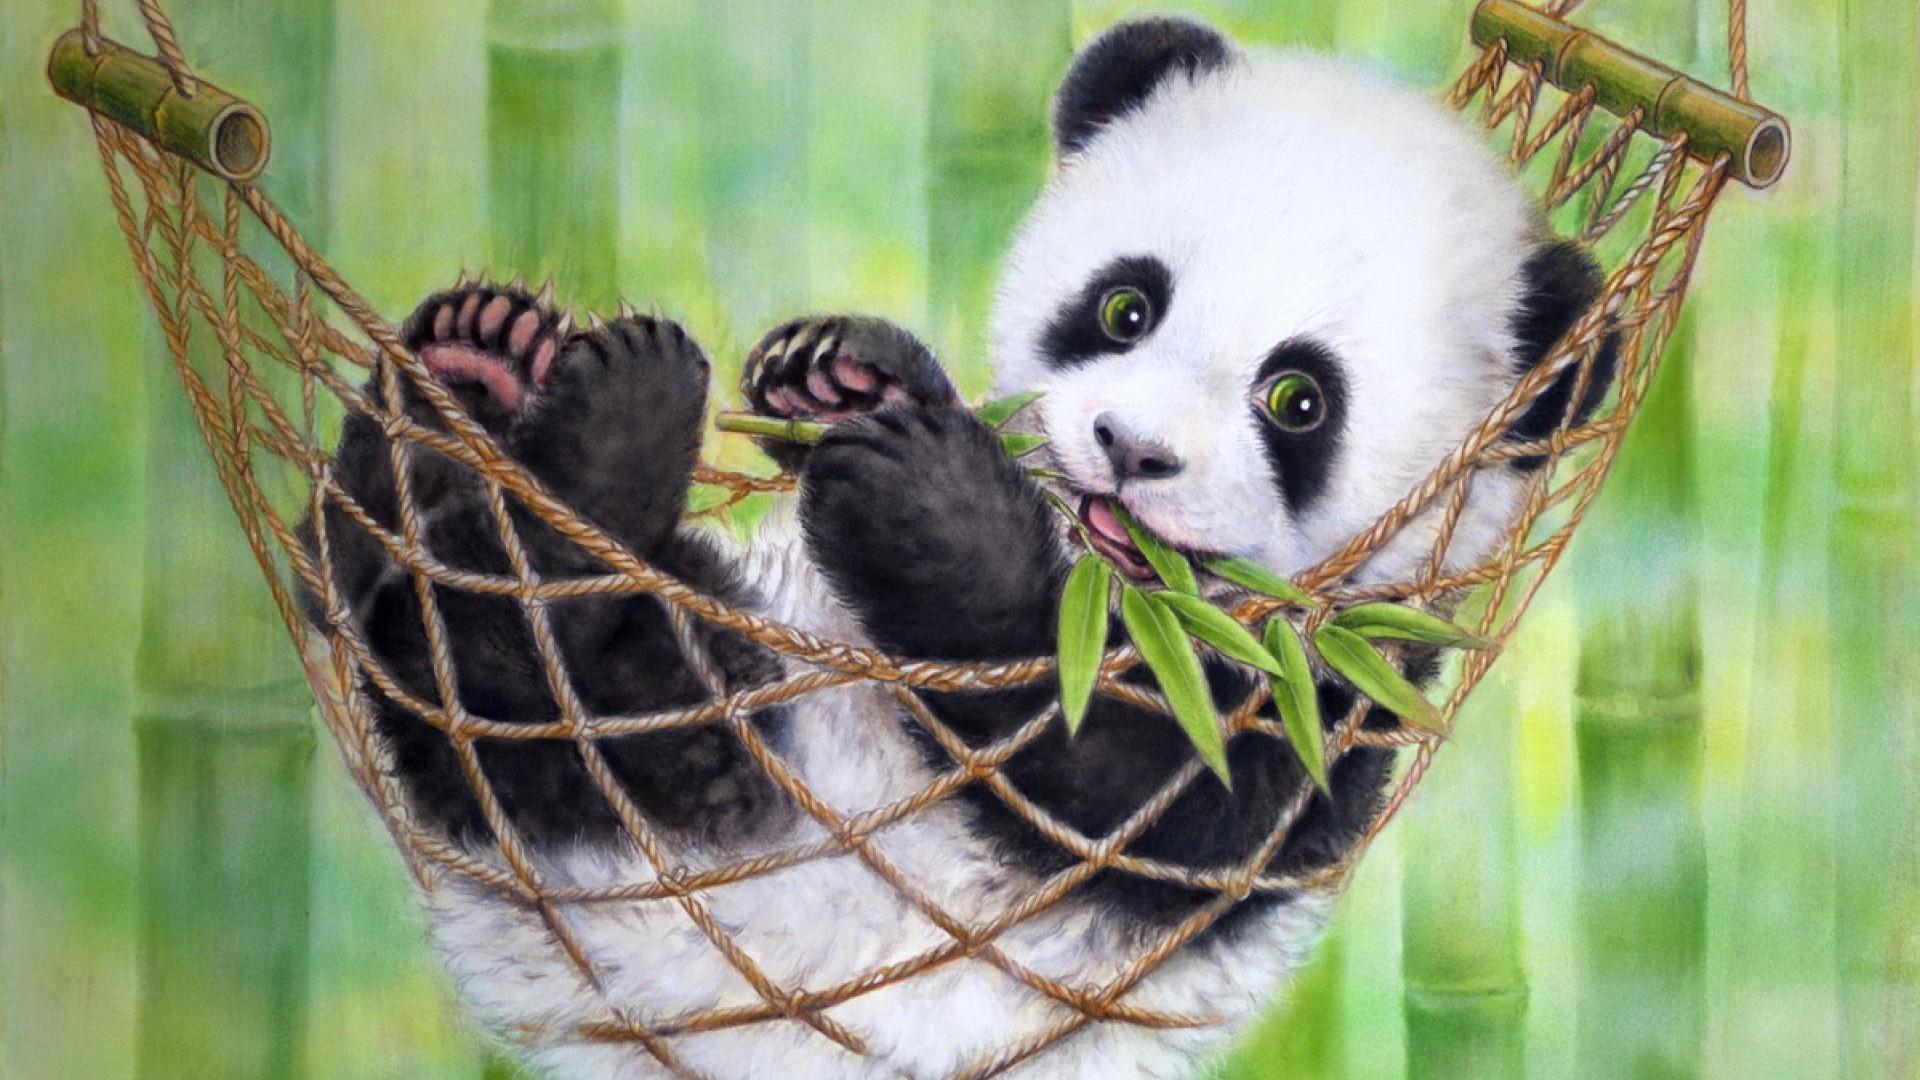 Baby Panda Wallpapers   Bhstormcom 1920x1080